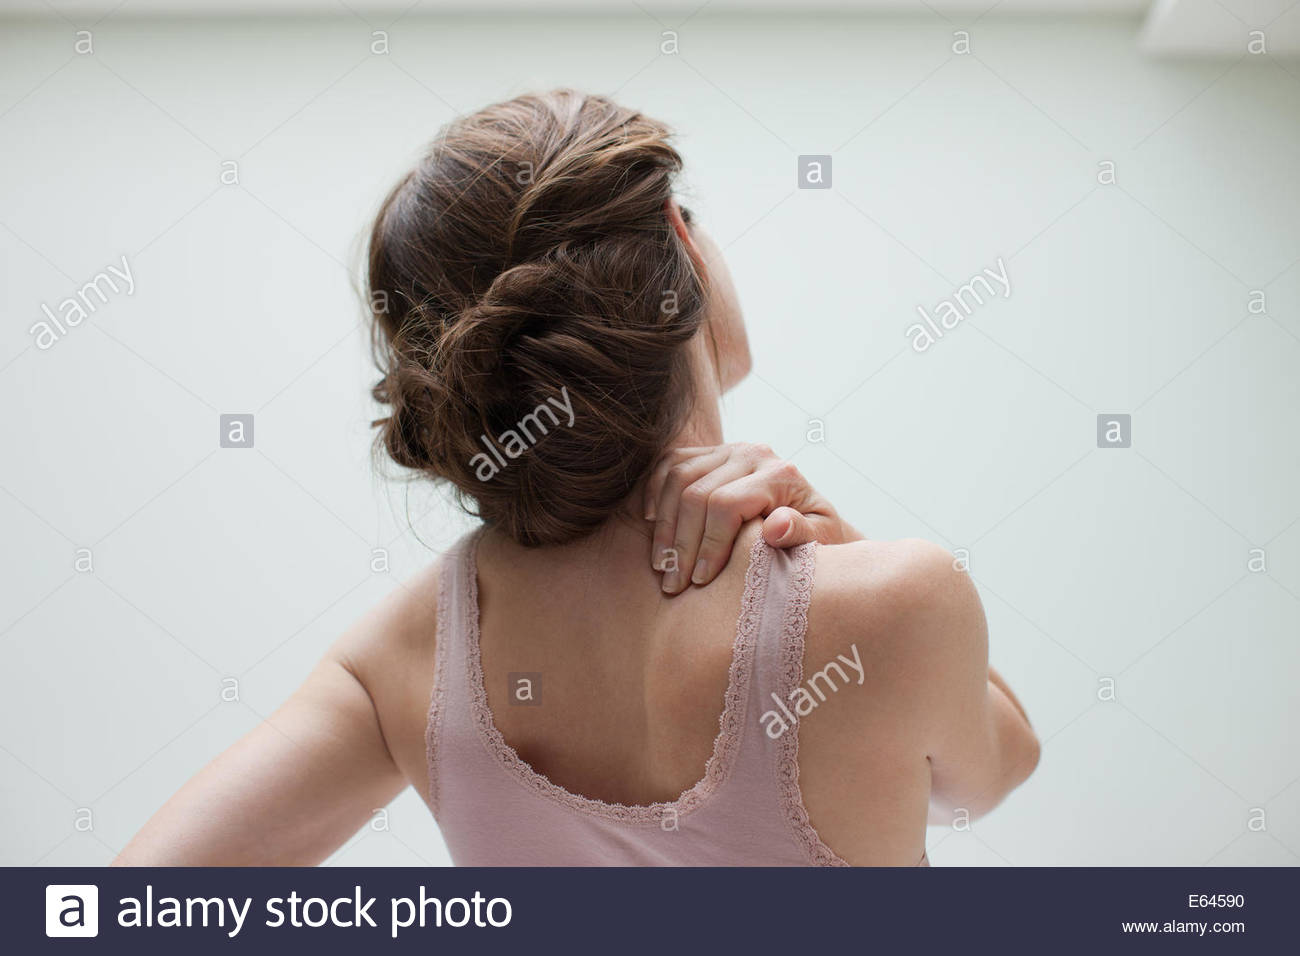 Woman rubbing aching back - Stock Image